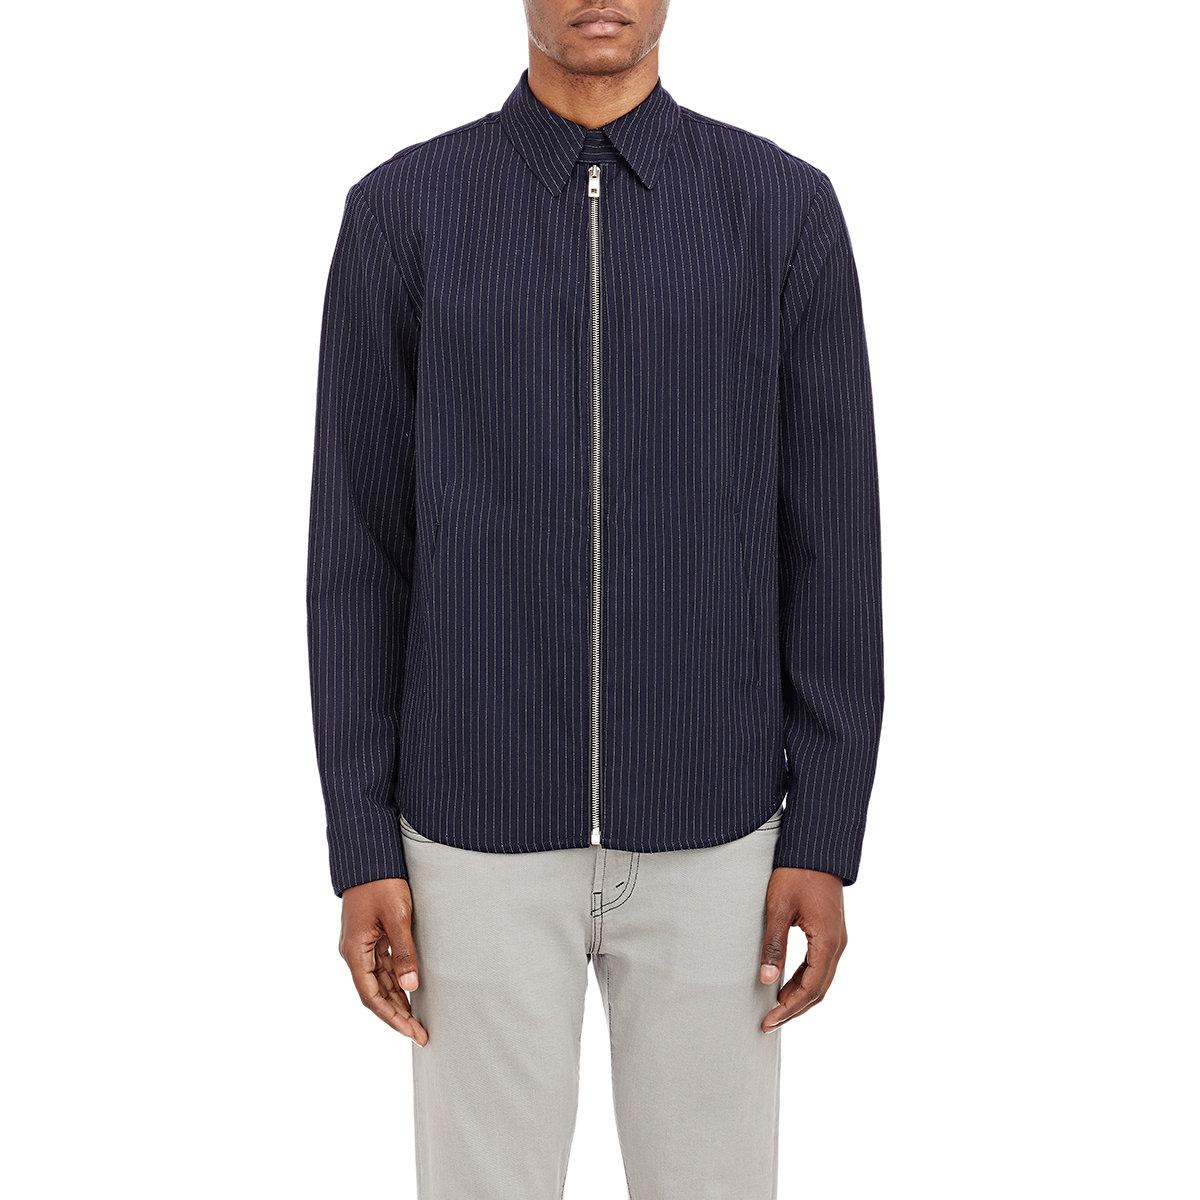 Rag bone men 39 s maddox shirt jacket in blue for men lyst for Rag and bone t shirts